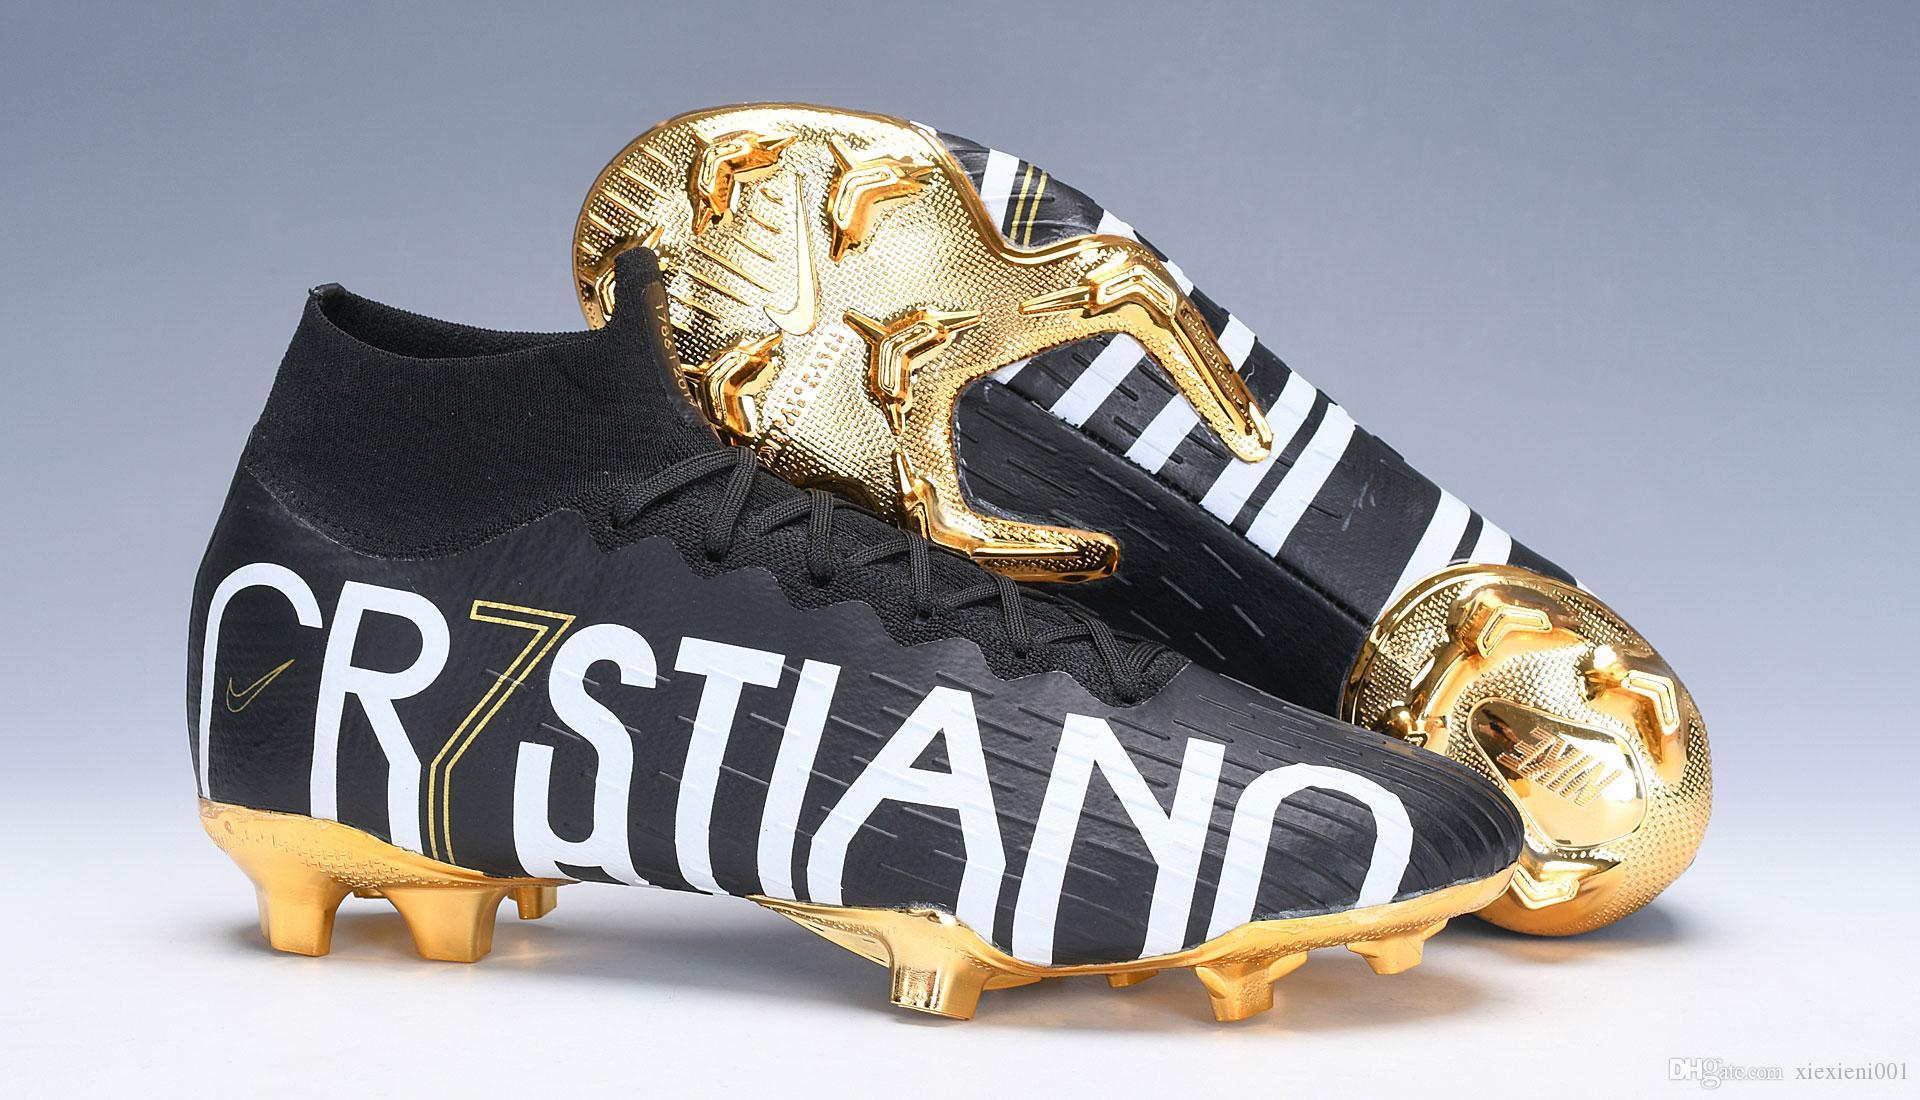 Original CR7 Children Soccer Cleats Mercurial Superfly VI 360 Elite Neymar Ronaldo FG CR7 Kids Soccer Shoes Ronaldo Womens Football Boots